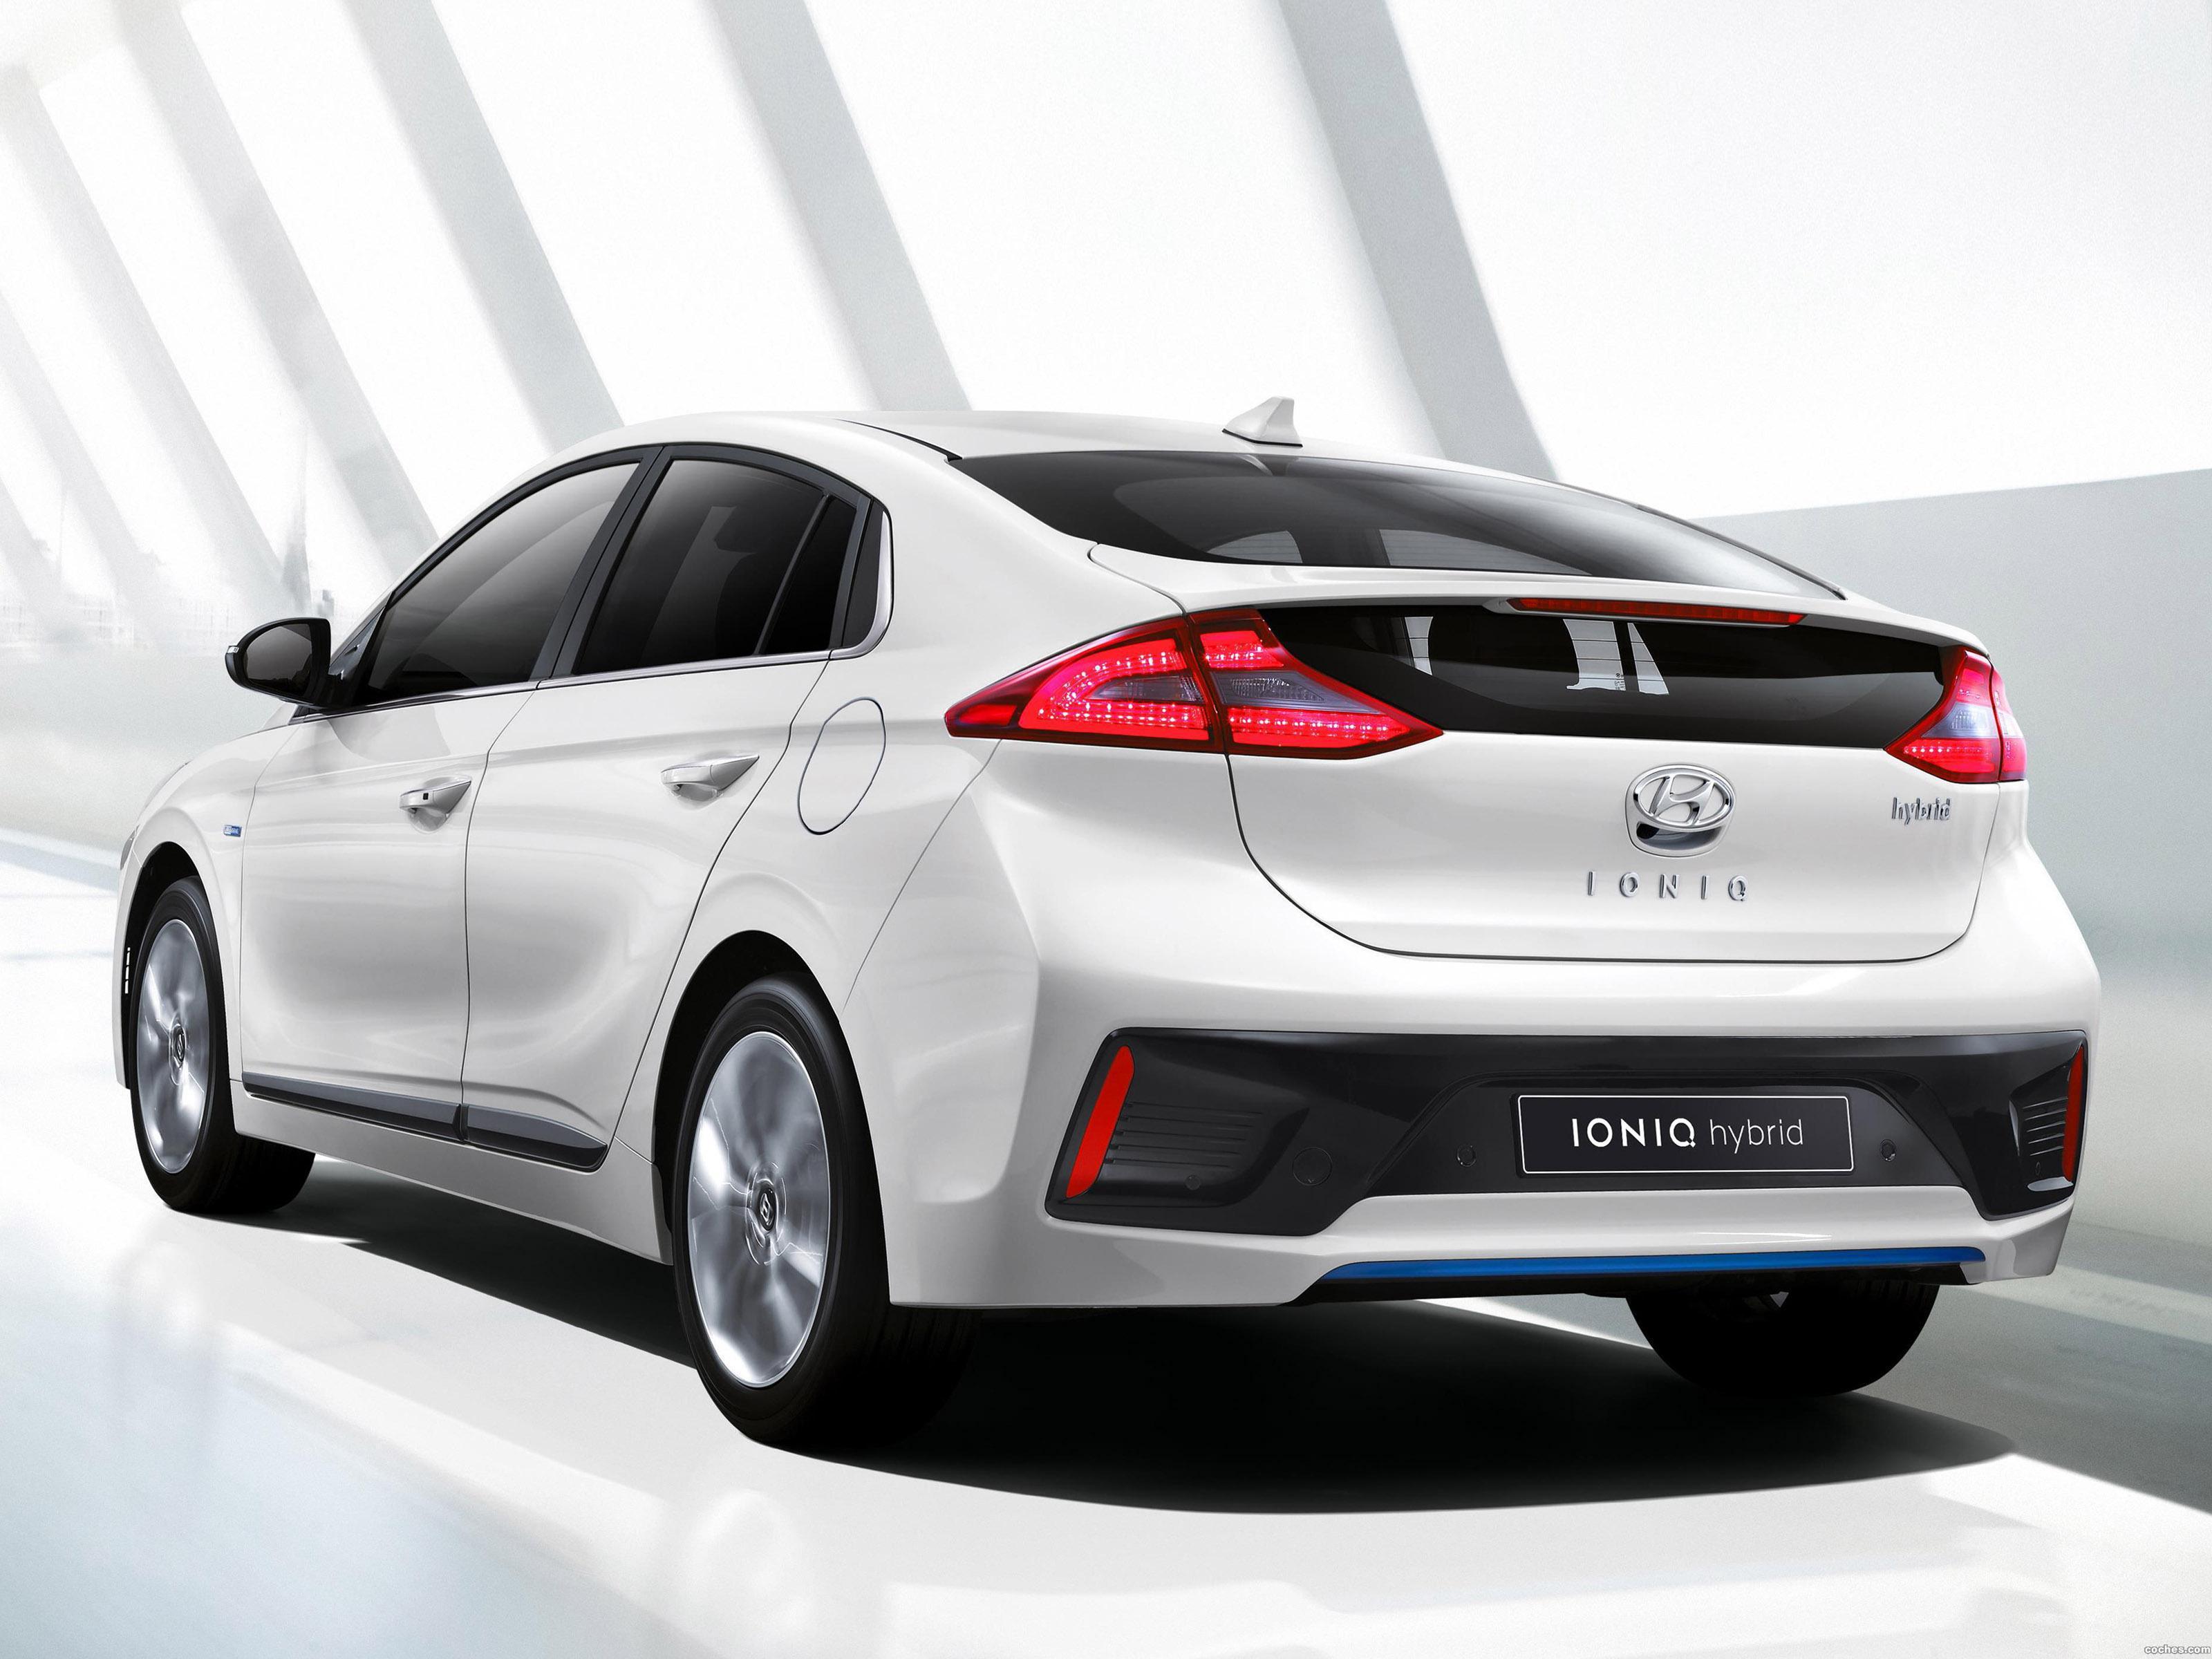 http://noticias.coches.com/wp-content/uploads/2016/03/hyundai_ioniq-hybrid-2016_r4.jpg